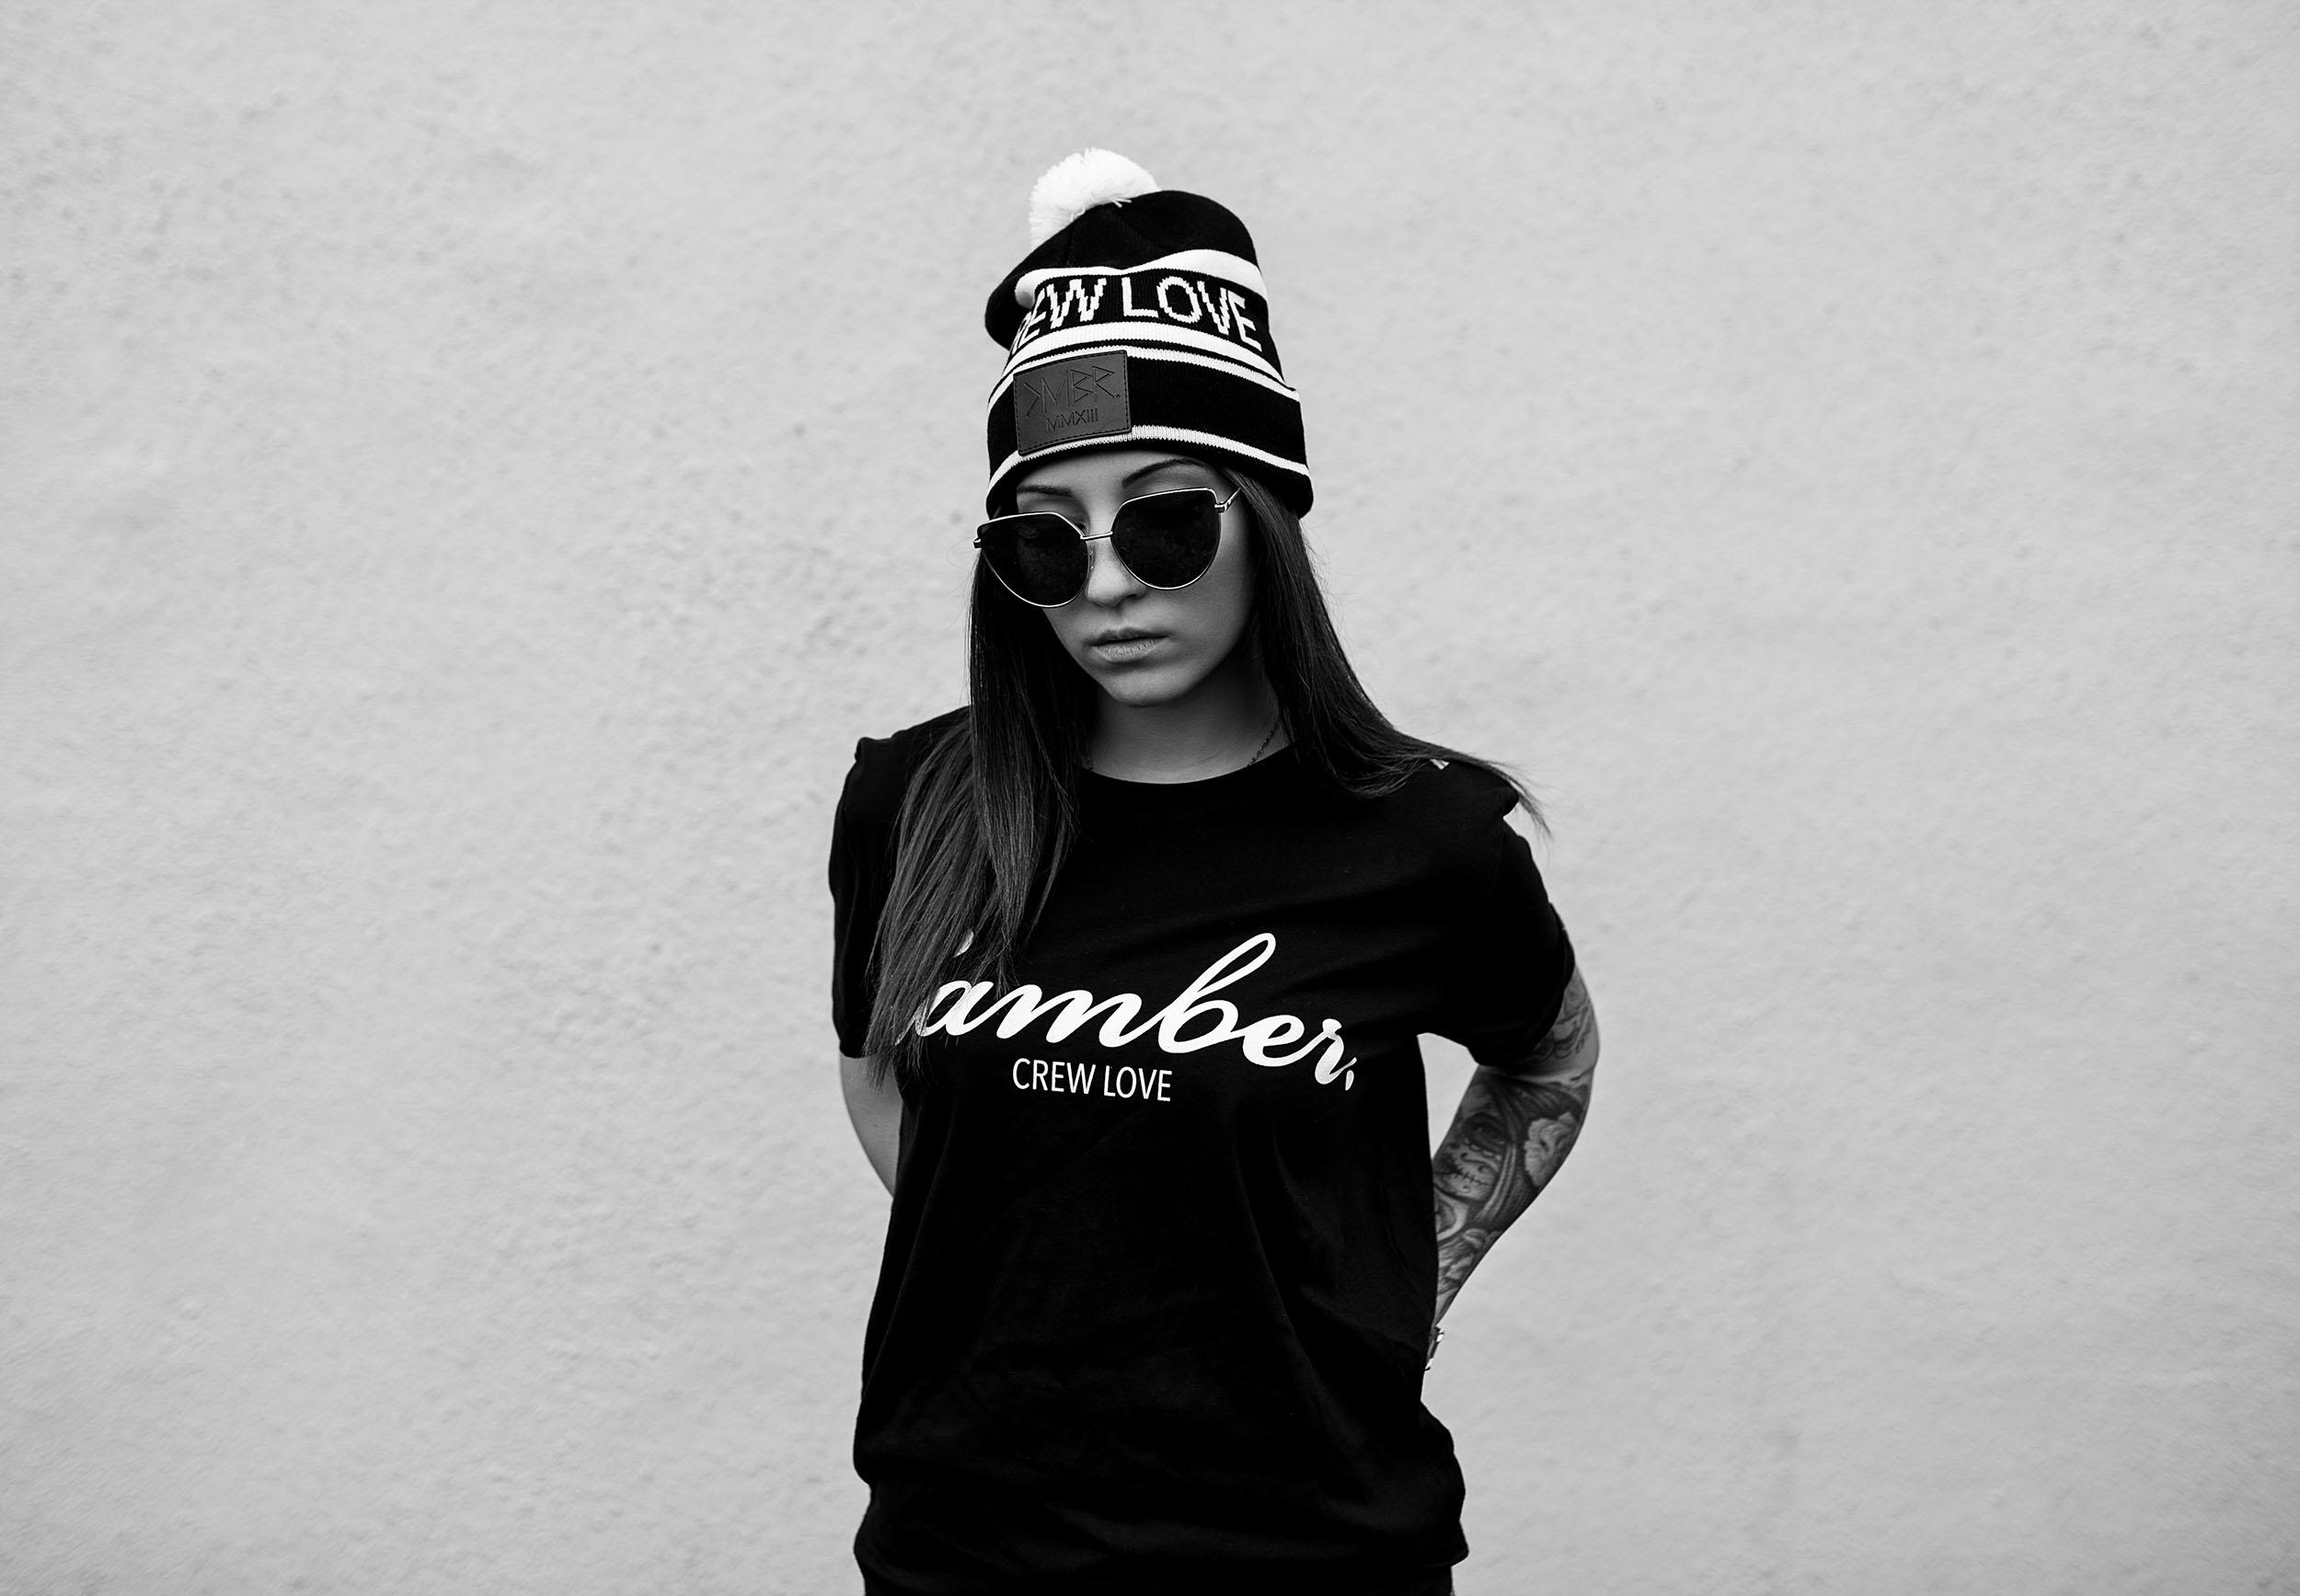 2017 Camber - Autumn/Winter set promo